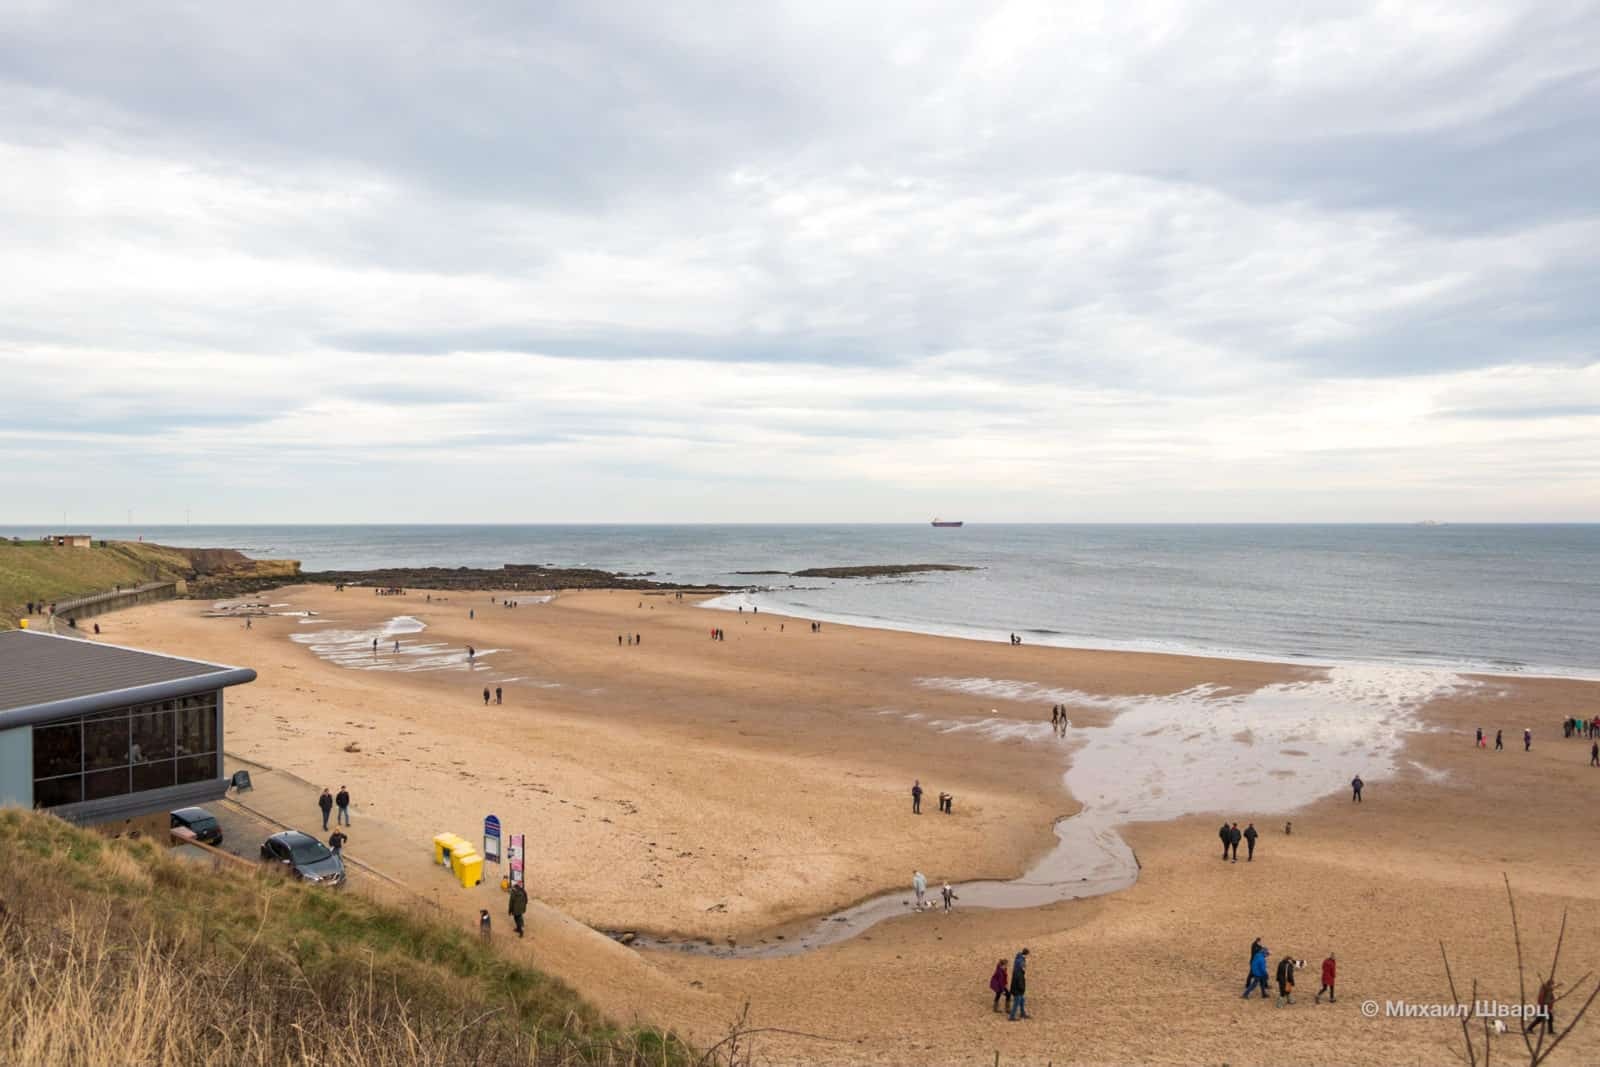 Пляж Tynemouth Beach плавно перетекает в пляж Long Sands Beach